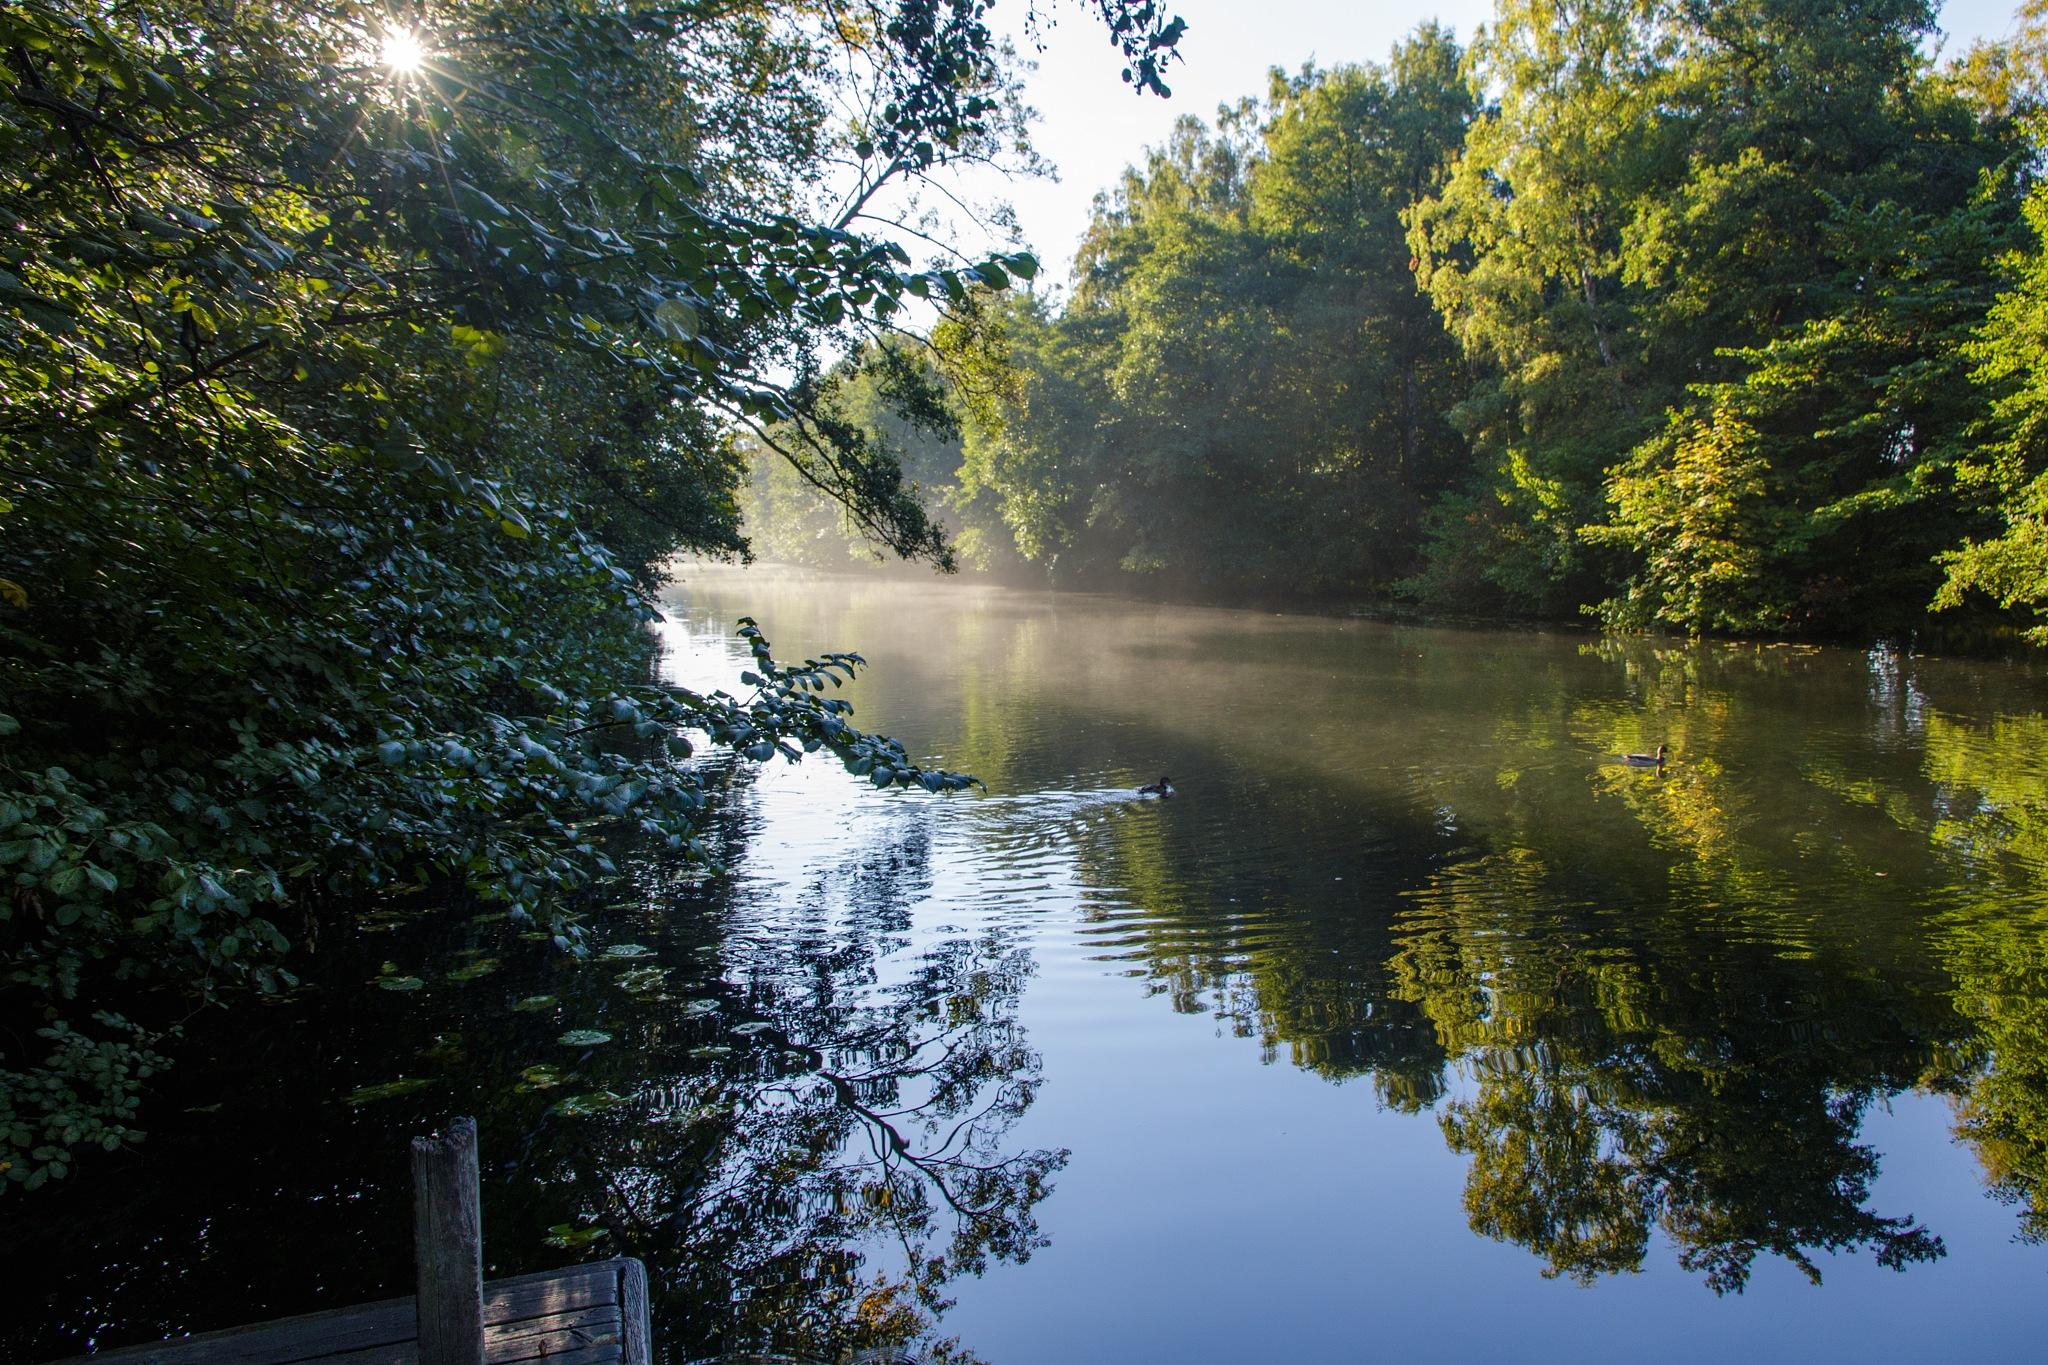 Crossing the river in the morning sun by Bjarne Gertz Pedersen